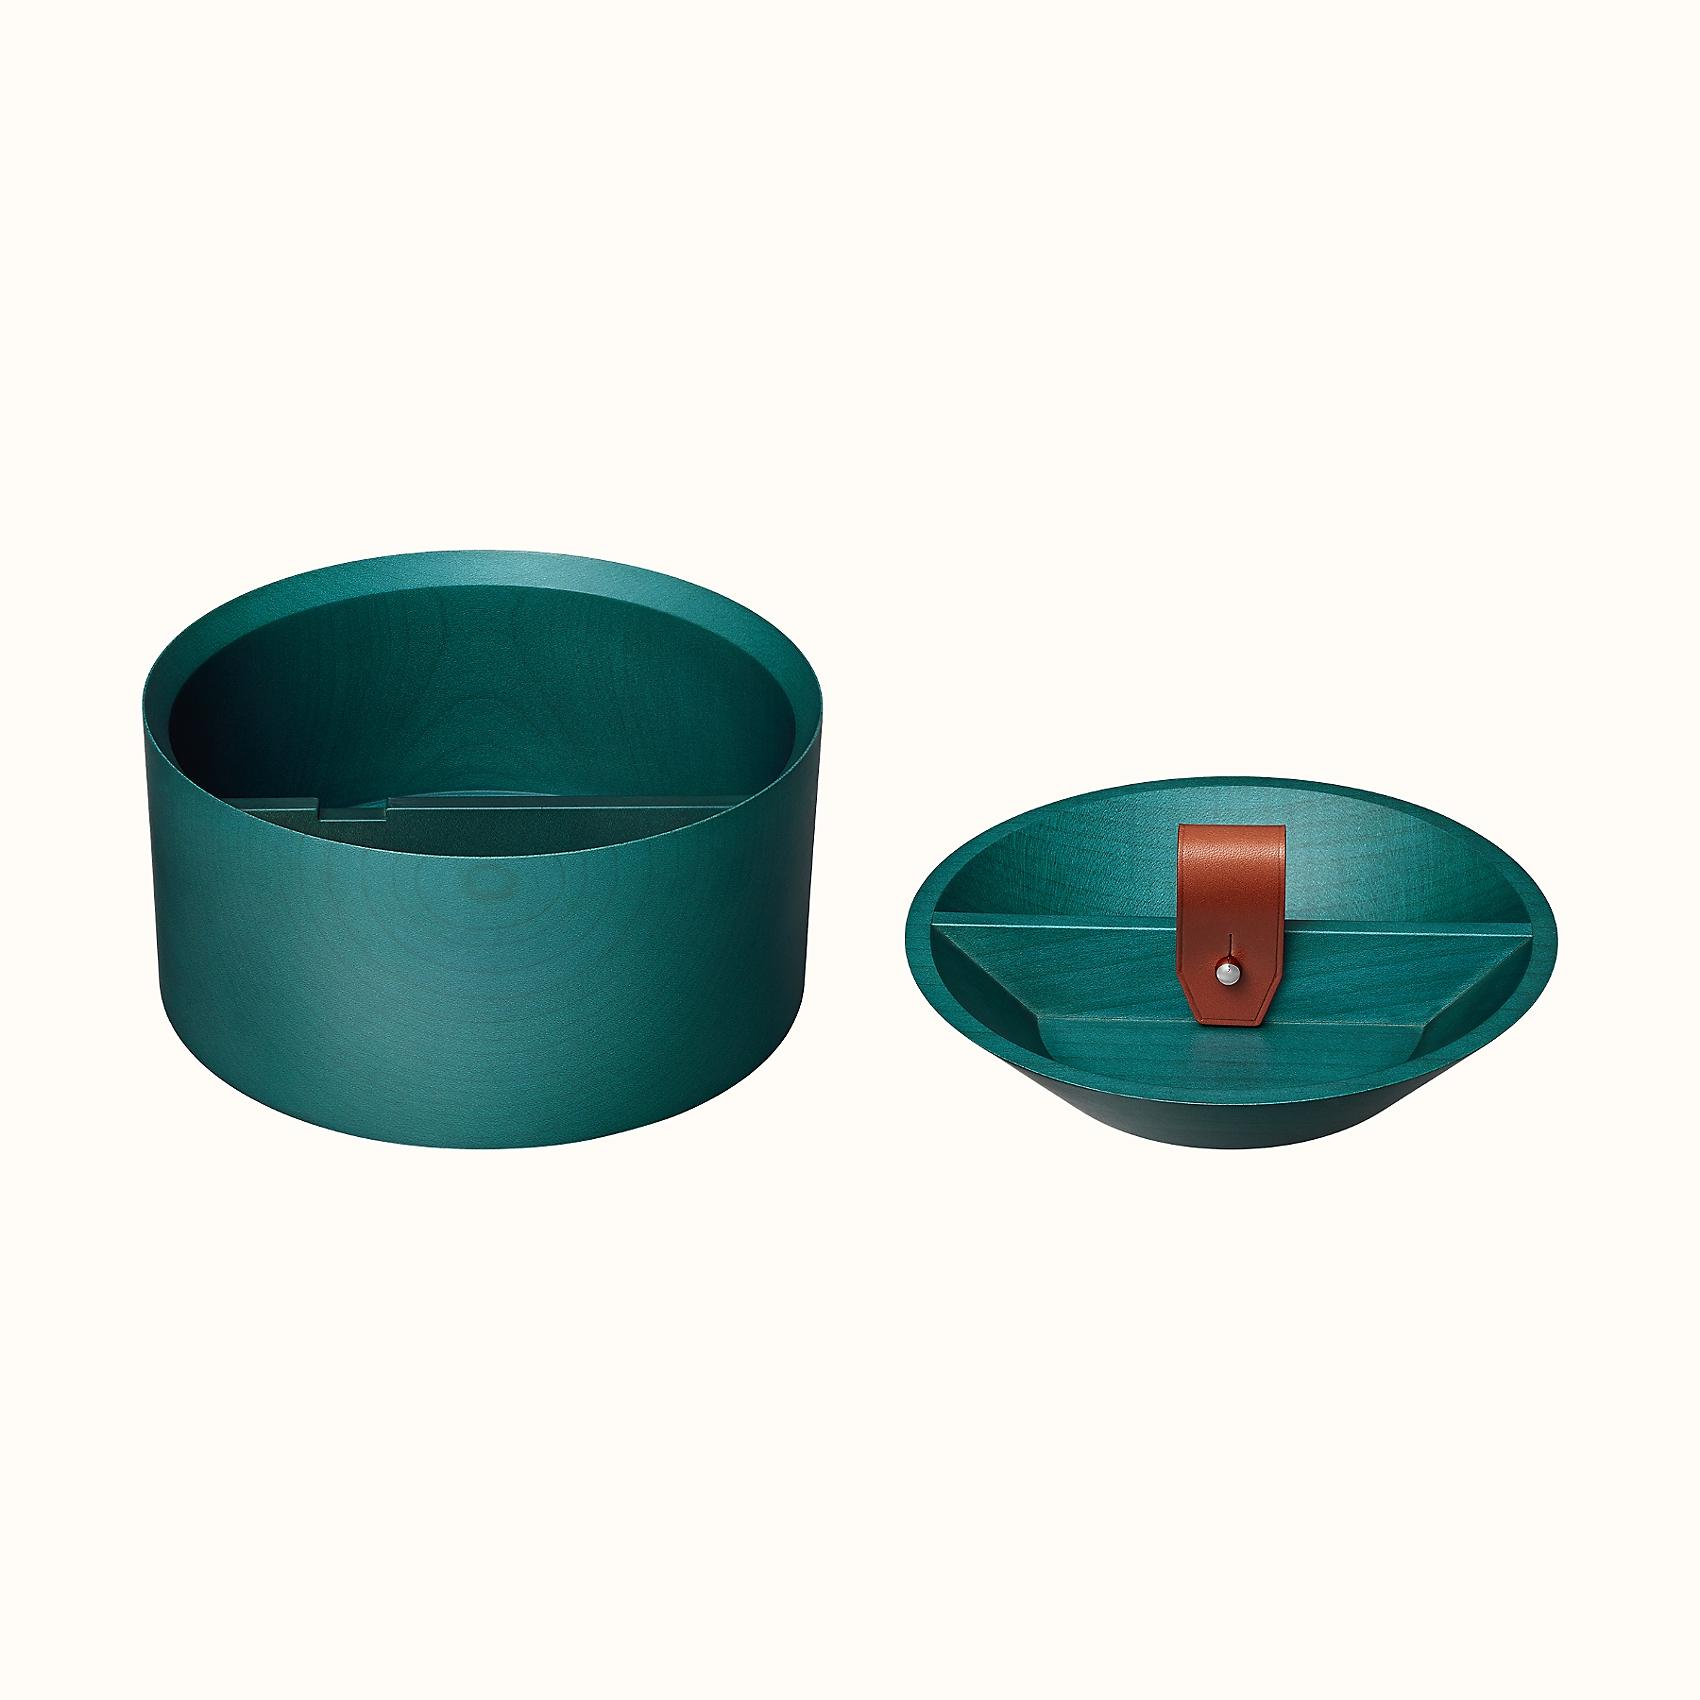 HERMES Tibi round box - Bleu Indigo